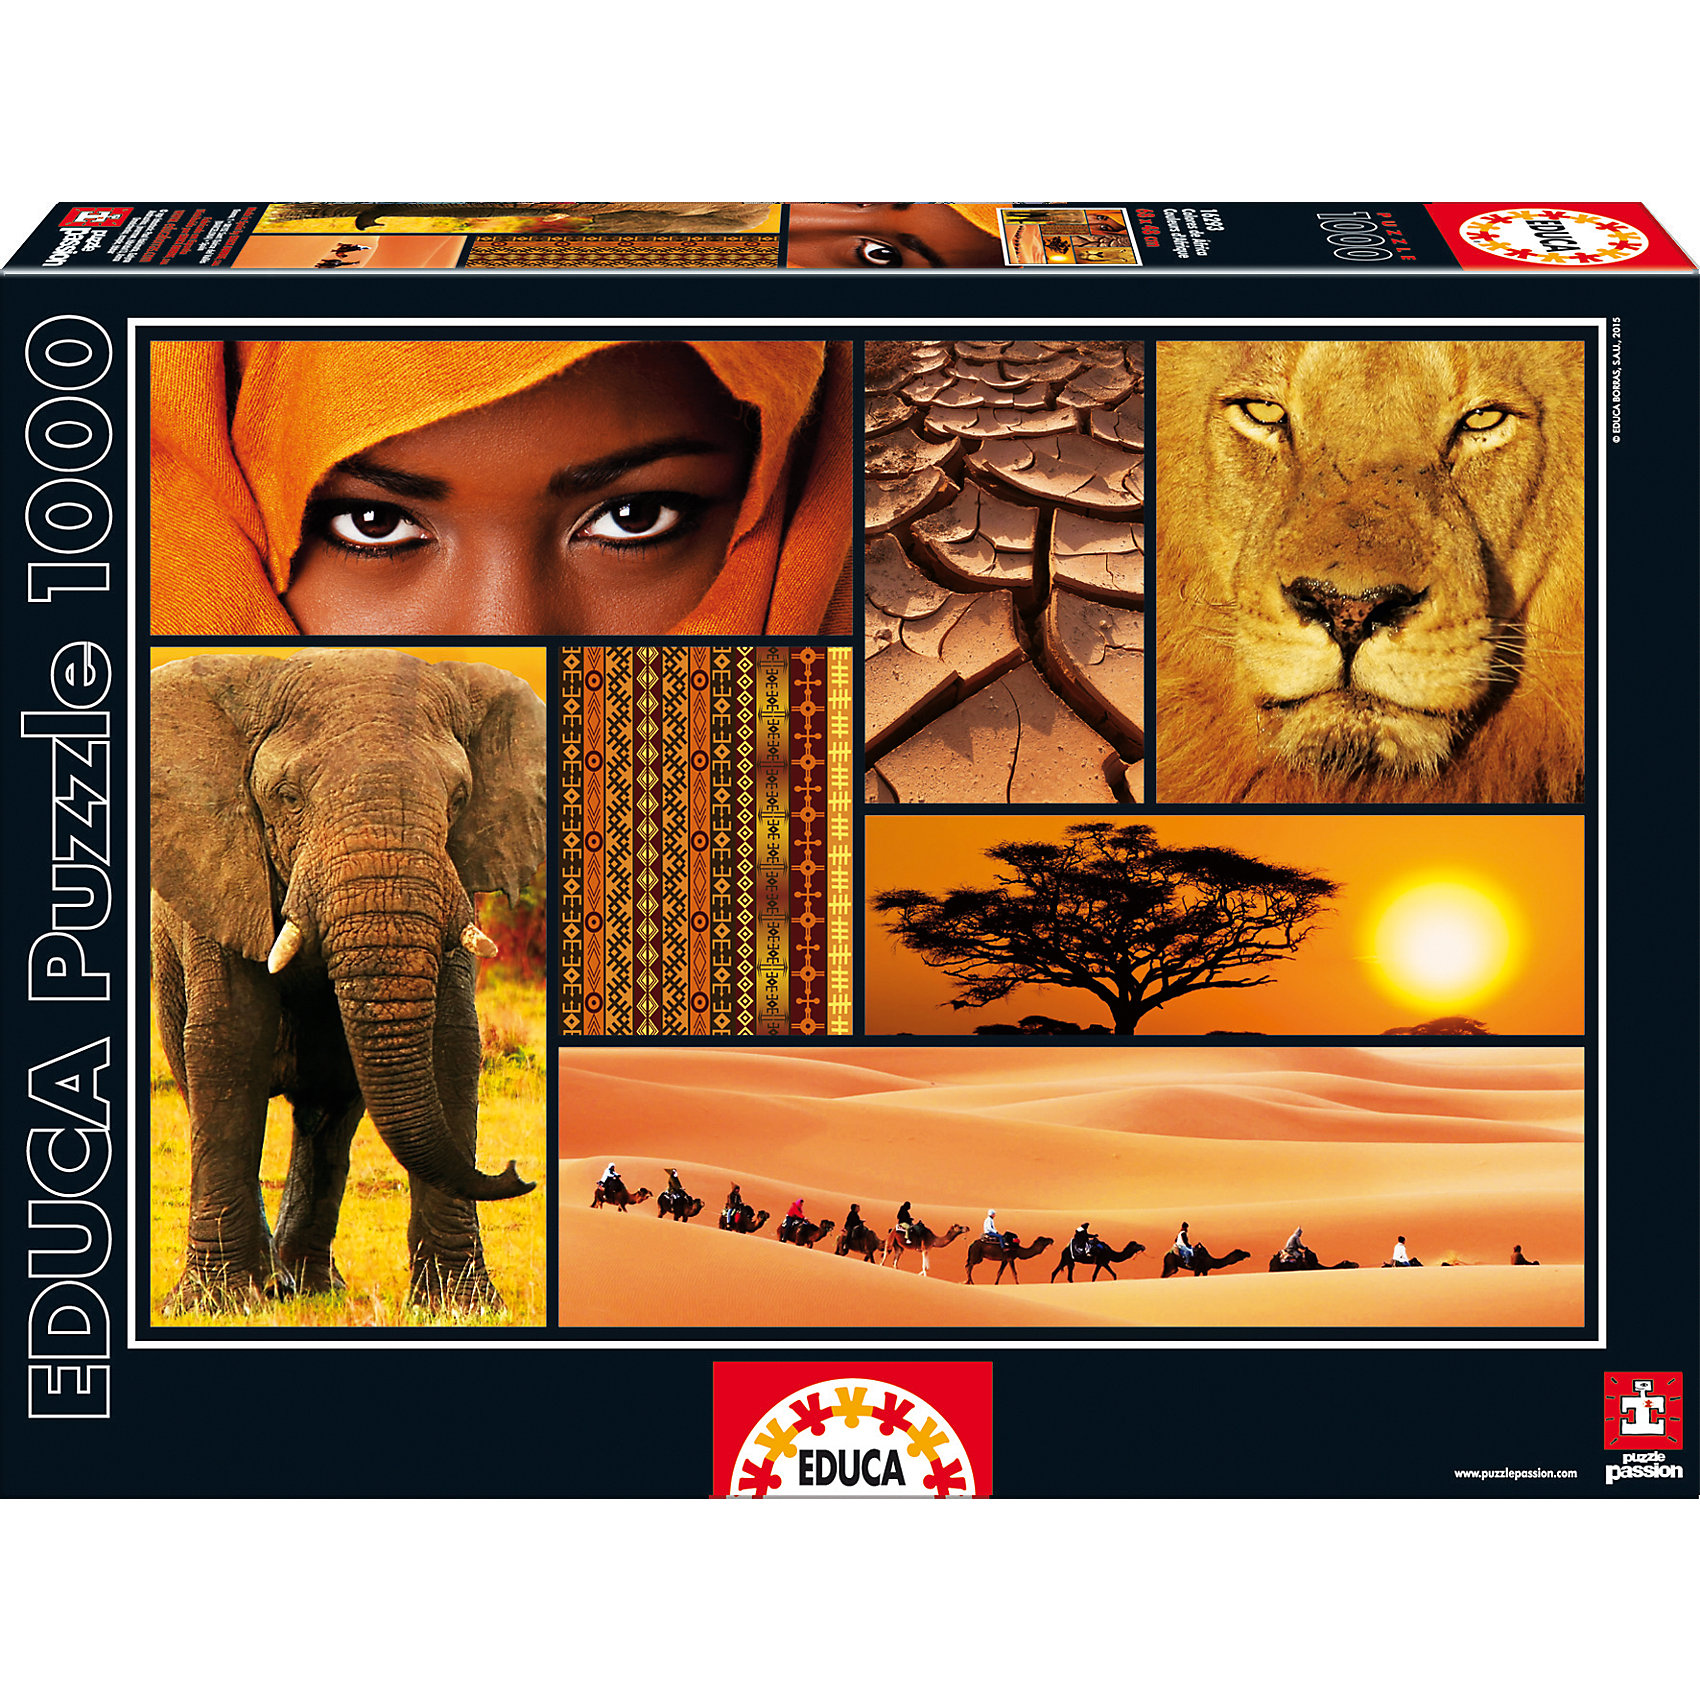 Пазл Мир Африки, 1000 деталей, EducaПазлы для детей постарше<br><br><br>Ширина мм: 317<br>Глубина мм: 270<br>Высота мм: 55<br>Вес г: 768<br>Возраст от месяцев: 60<br>Возраст до месяцев: 2147483647<br>Пол: Унисекс<br>Возраст: Детский<br>SKU: 5514311